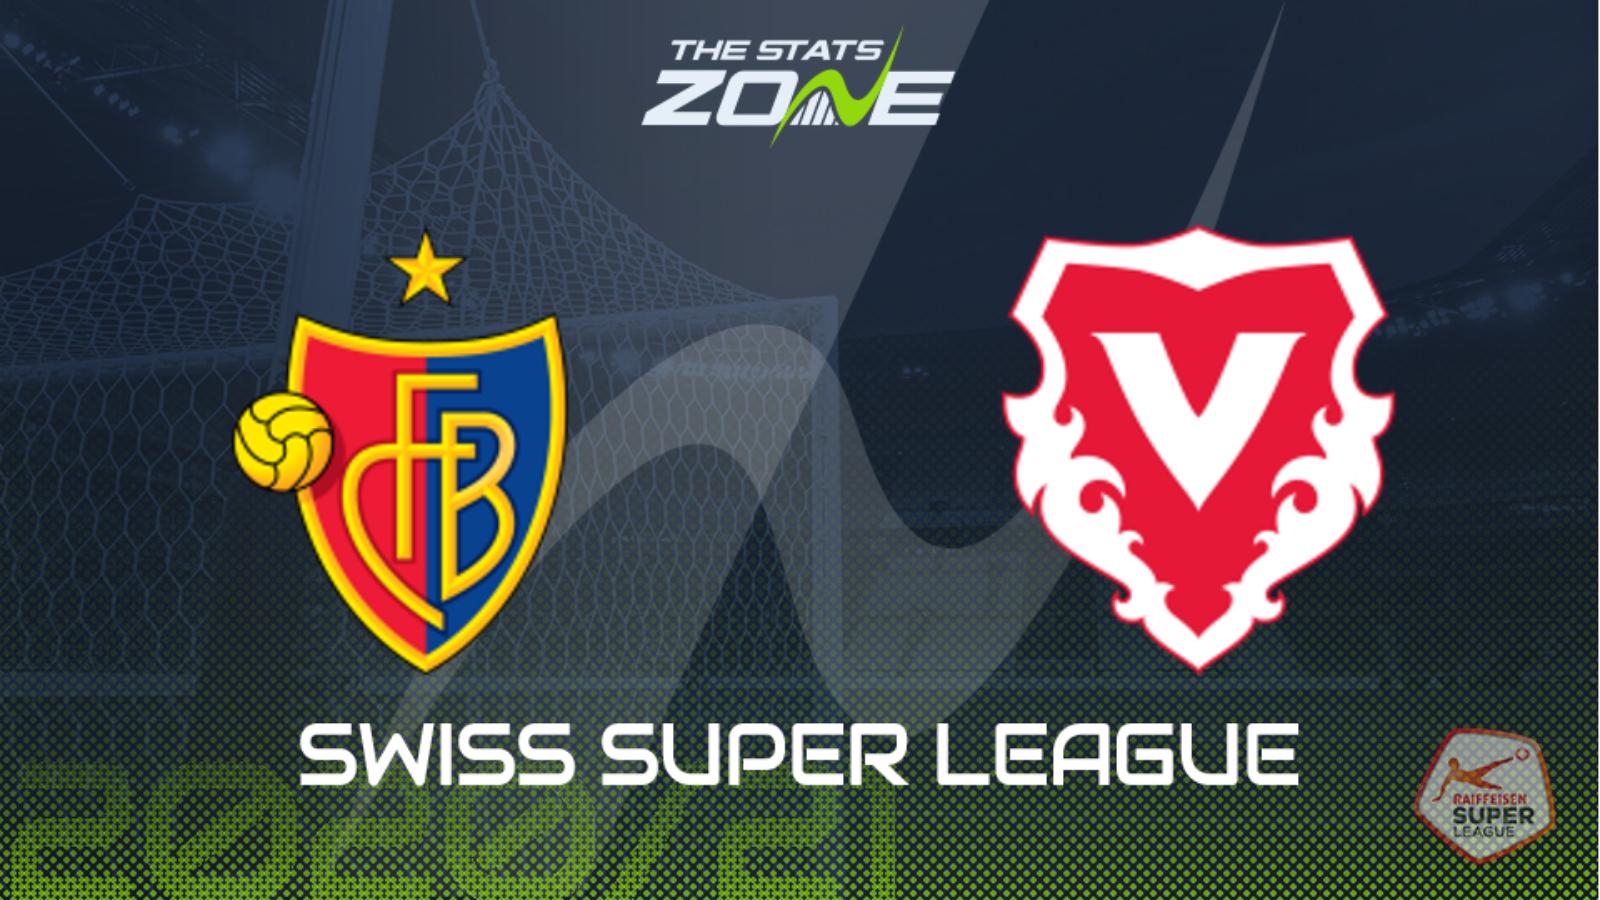 Vaduz vs basel betting tips 888 cricket betting site